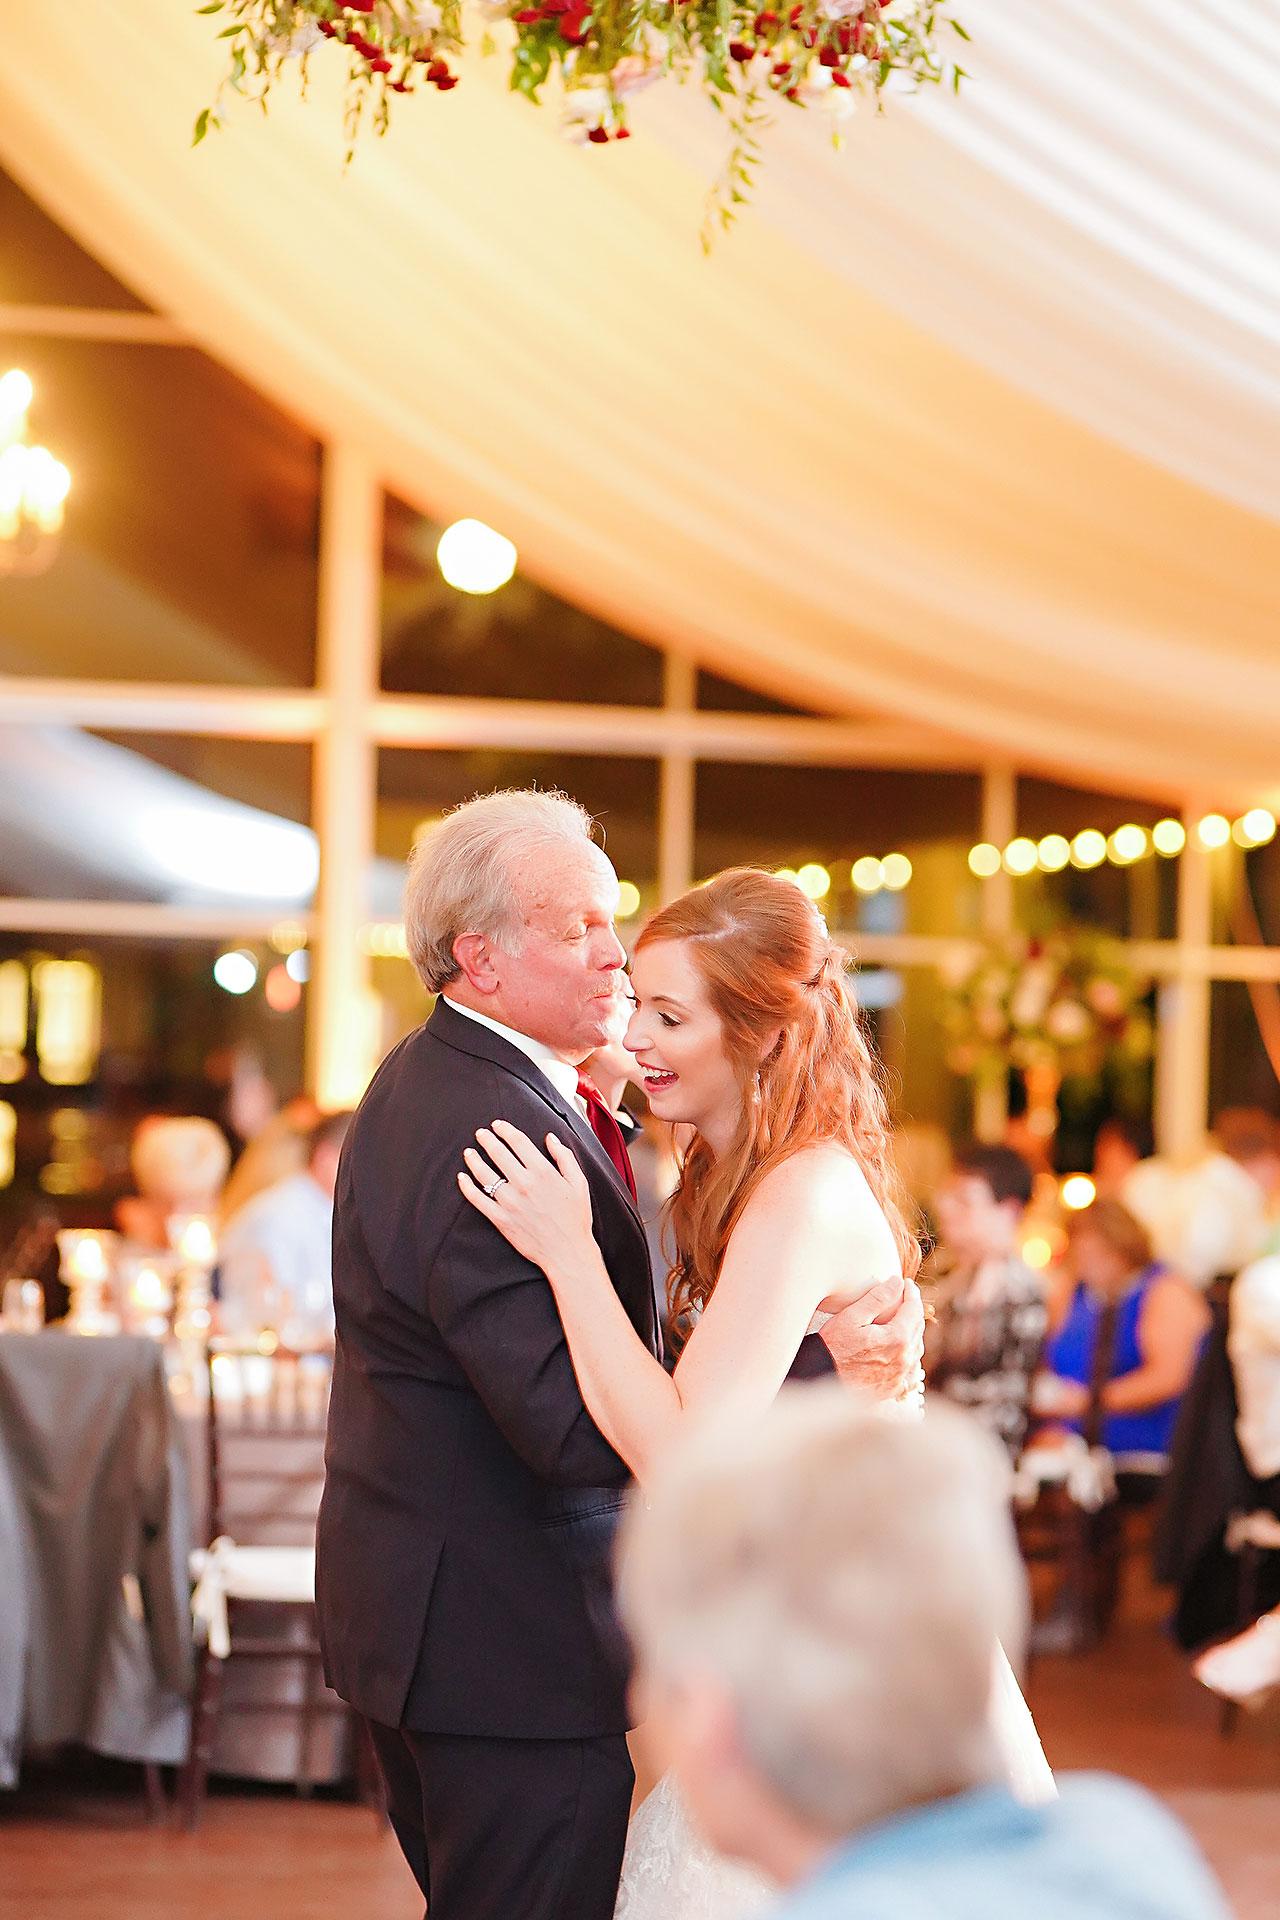 Callie Josh Ritz Charles Garden Pavilion Carmel Indiana Wedding 305